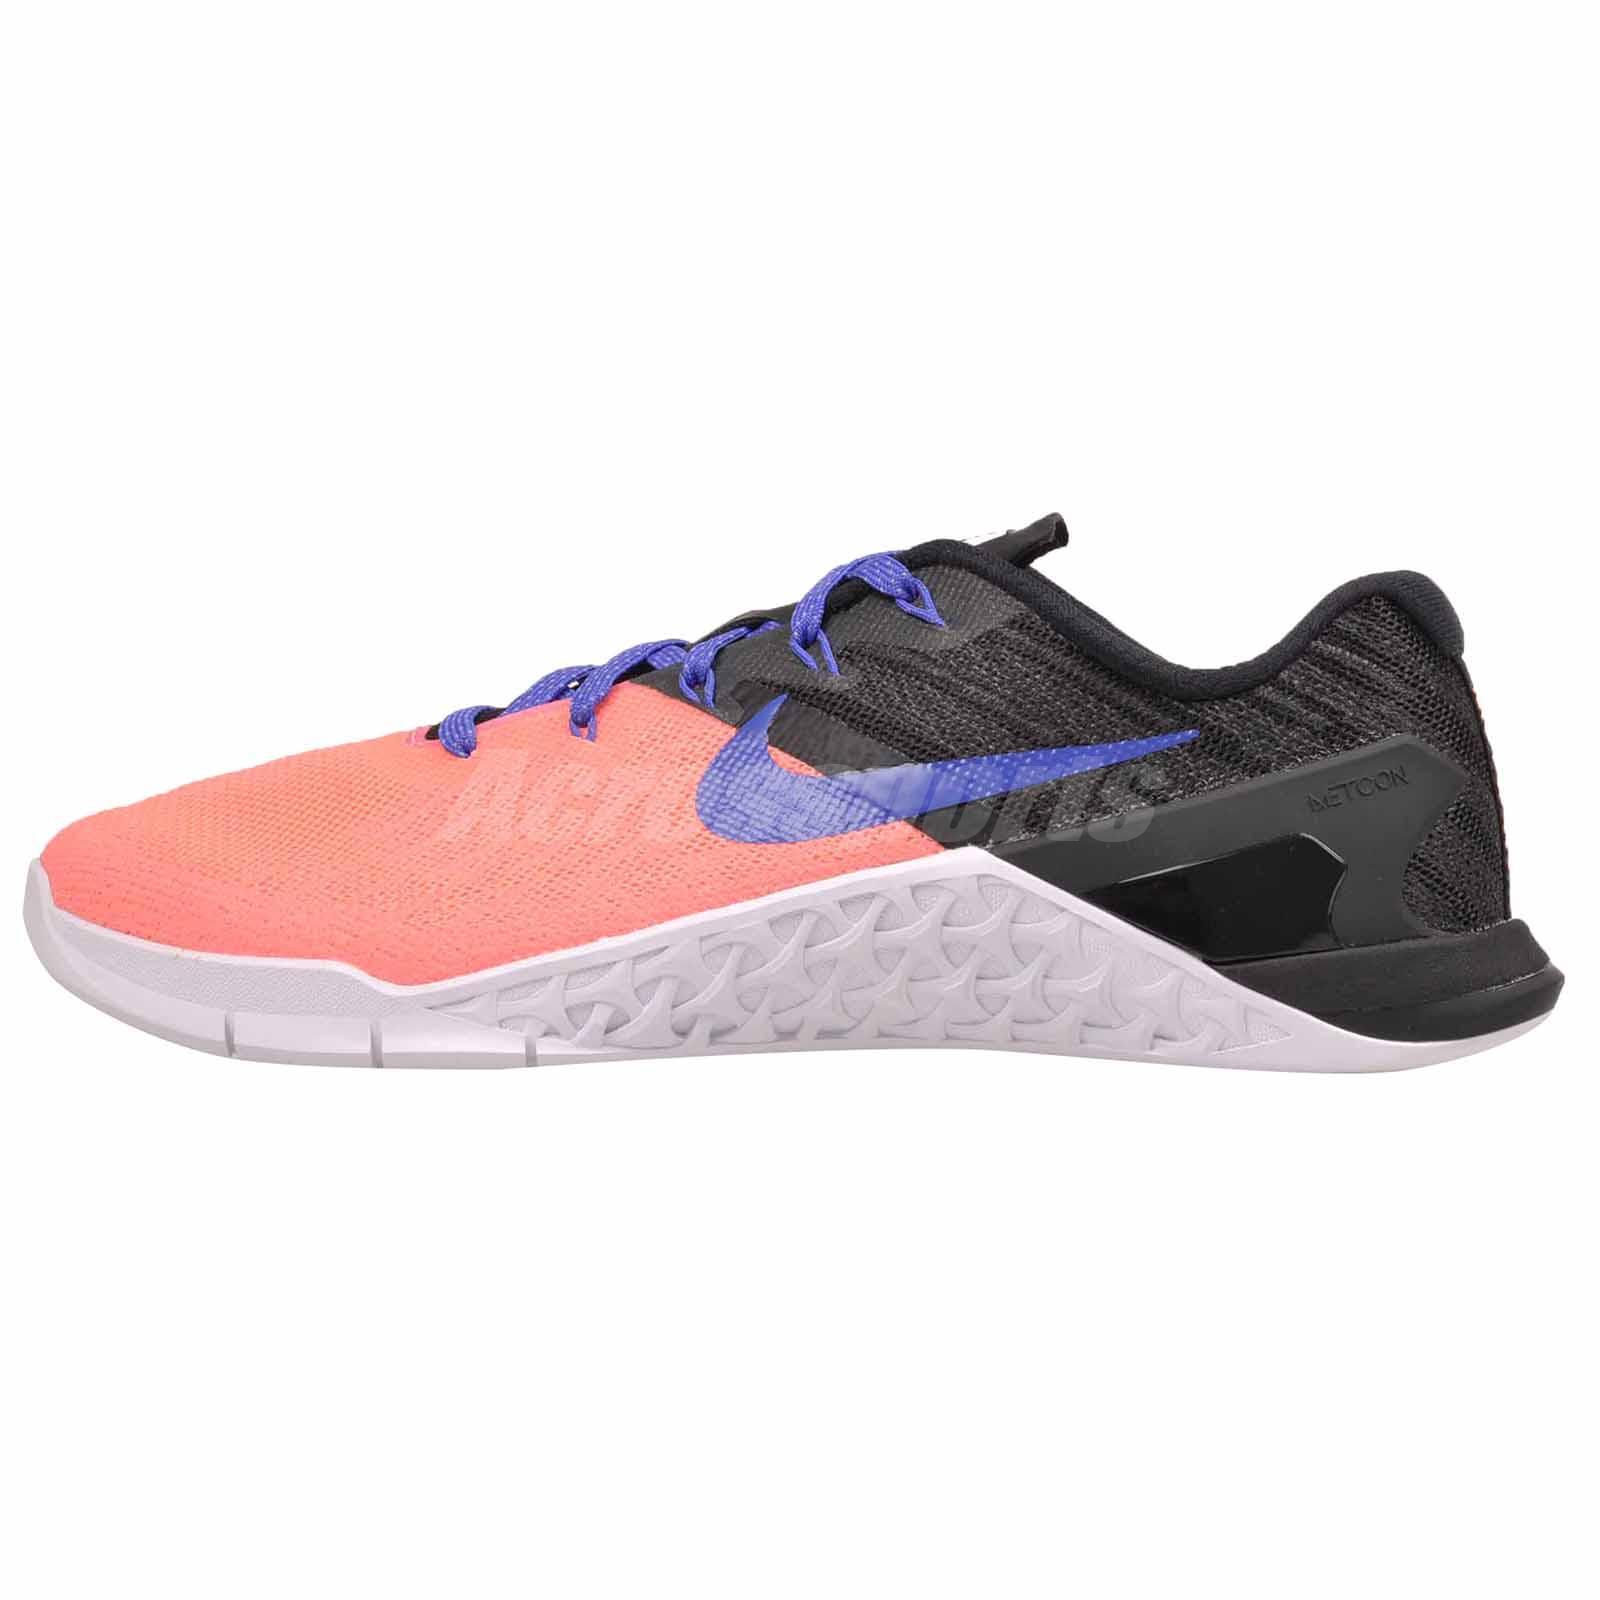 innovative design 74f9d 0f3ed Nike Wmns Metcon 3 Cross Training Womens Shoes Lava Glow 849807-600